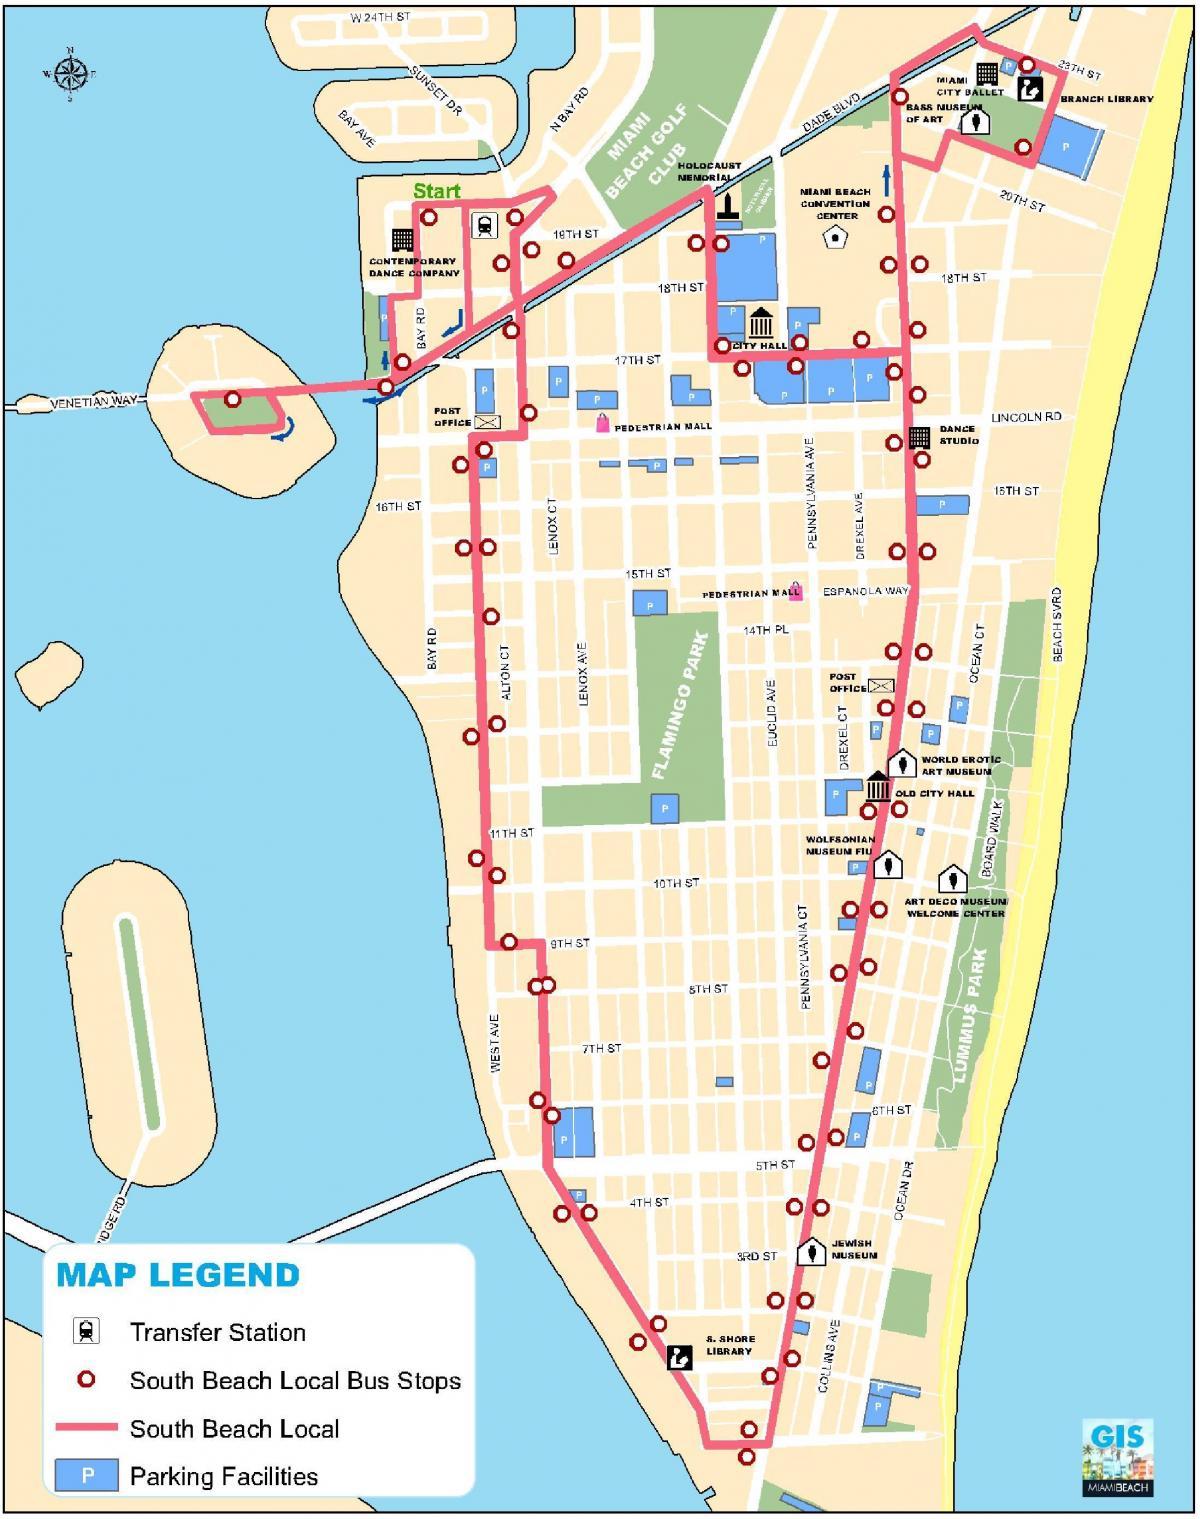 South Beach Miami Kort Kort Over South Beach Miami Florida Usa